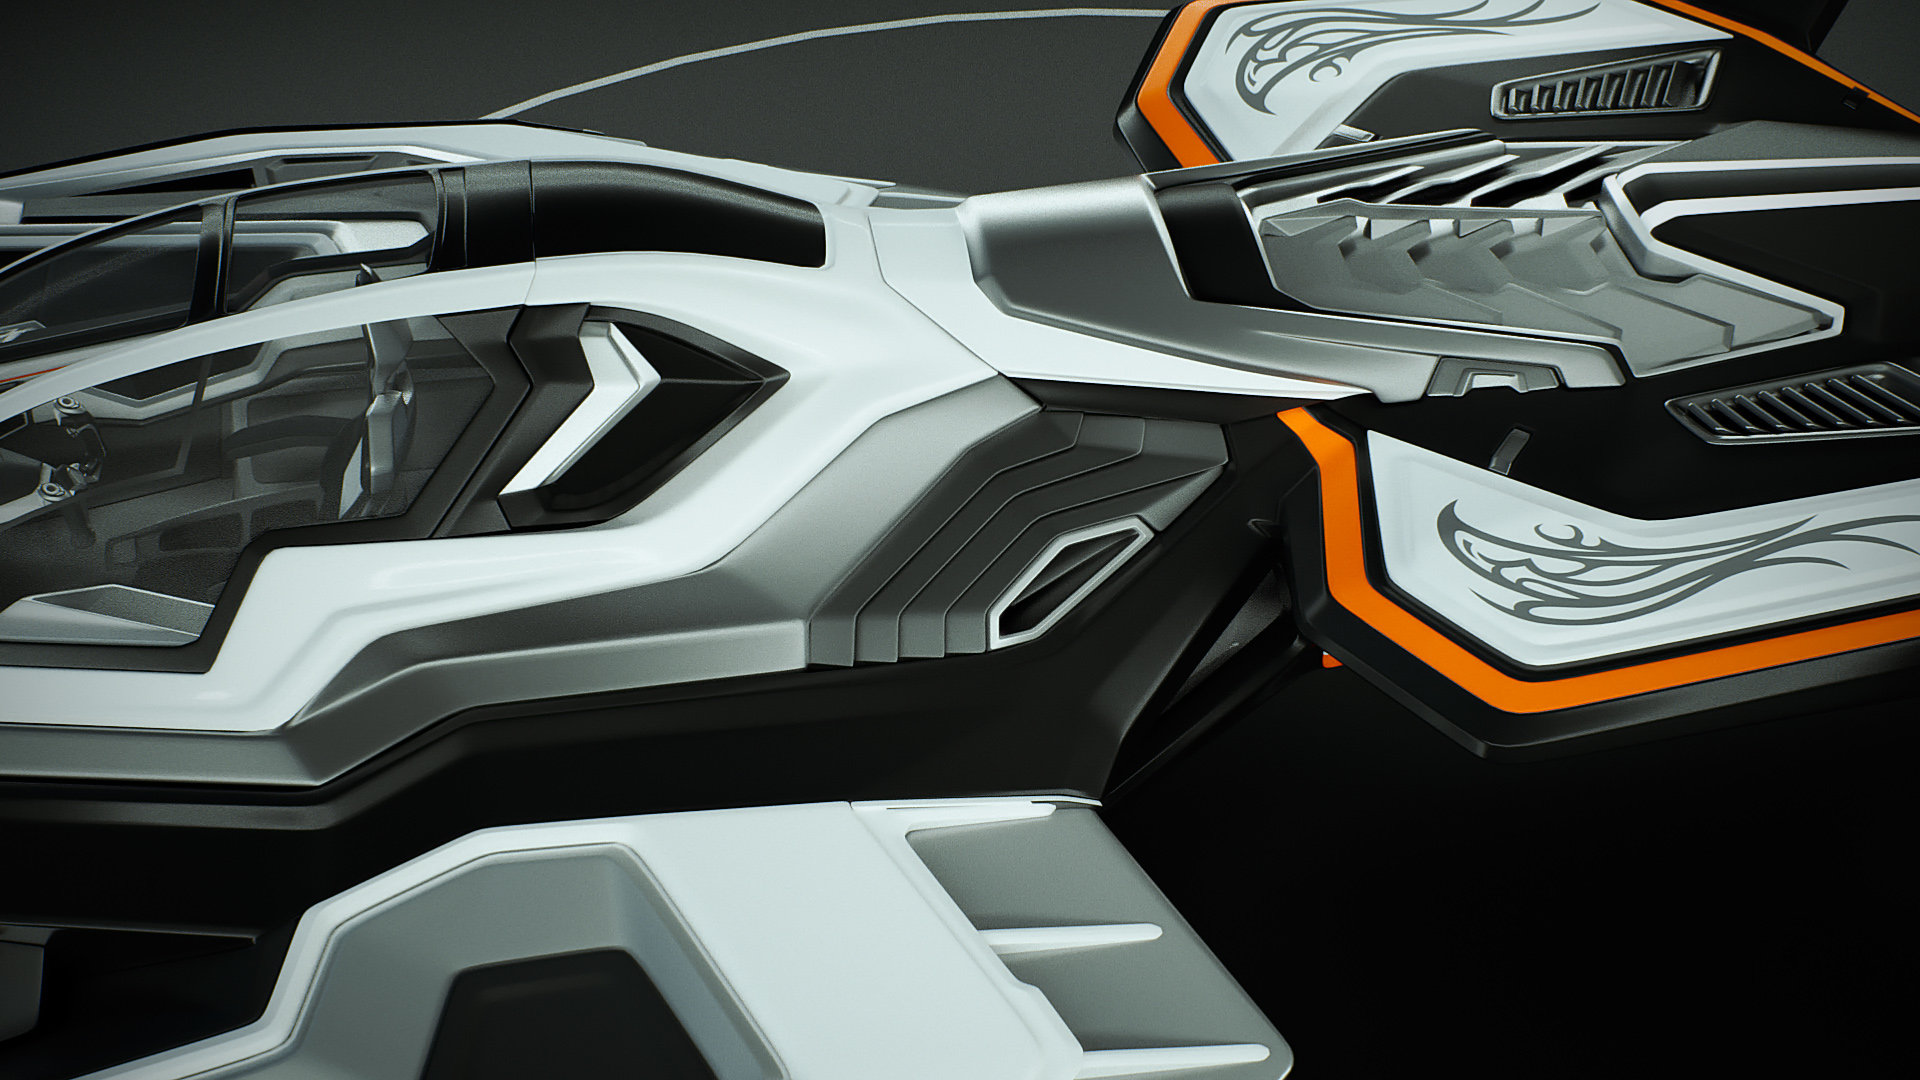 Johan de leenheer 3d spaceship faucer fuga mx230e 13